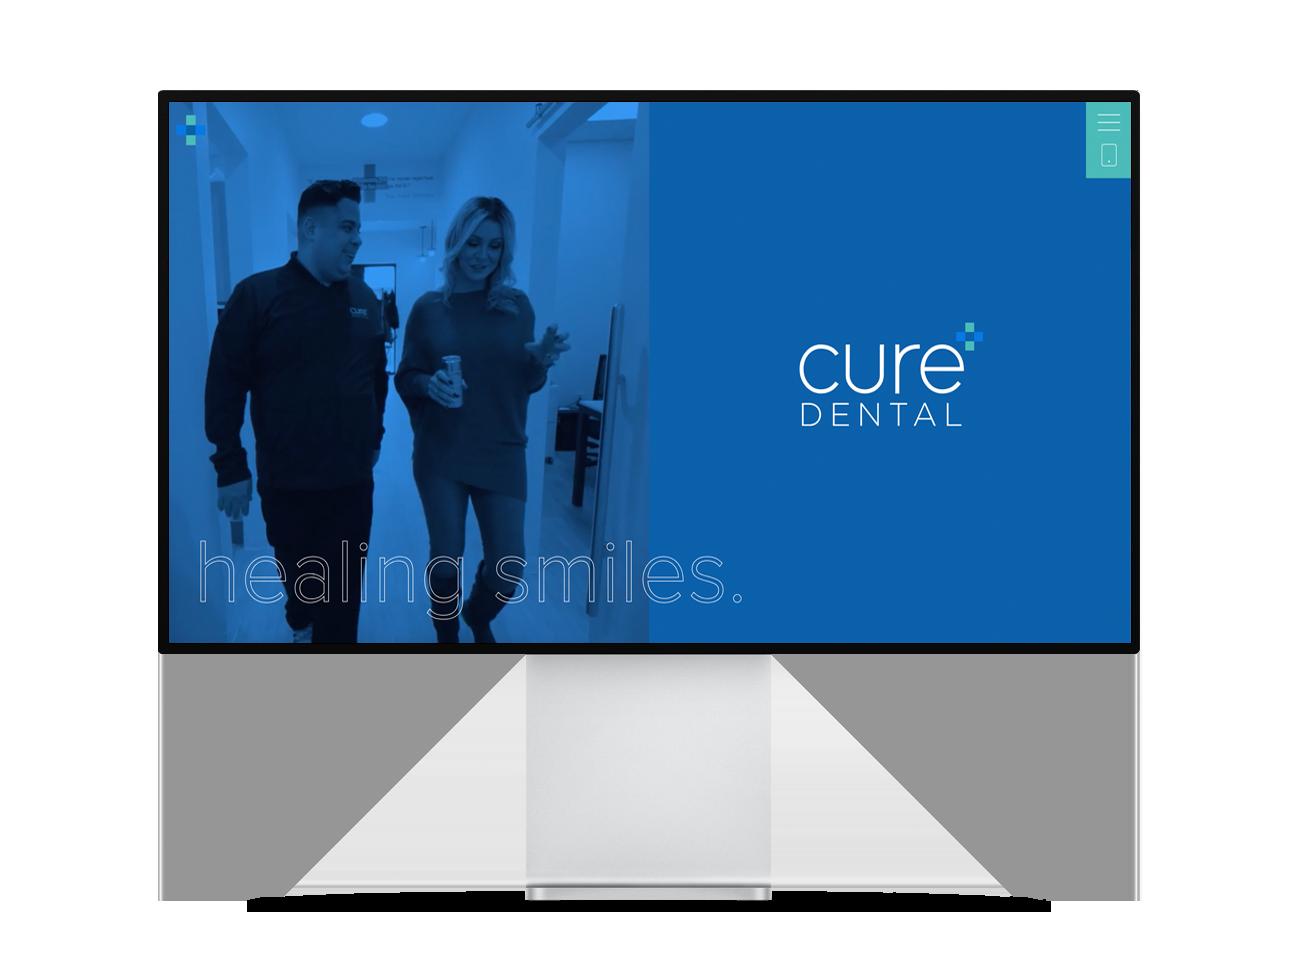 Screenshot of the Cure Dental homepage